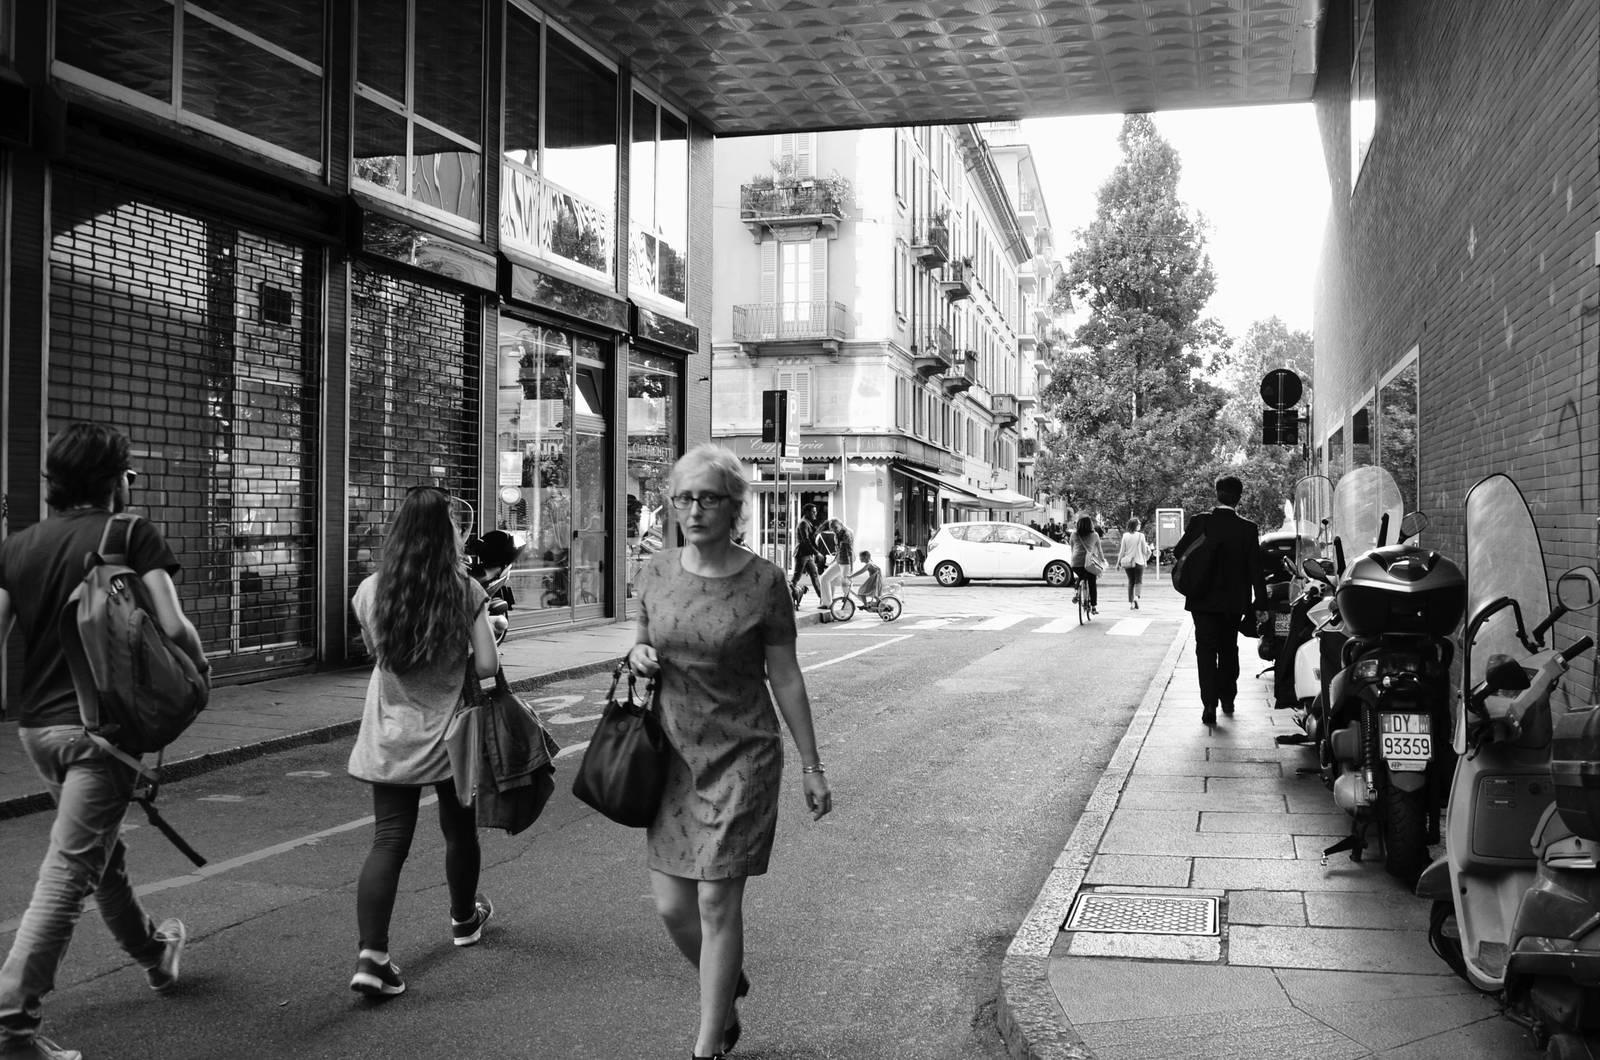 la_strada_by_batsceba_dbah1w7-fullview.jpg